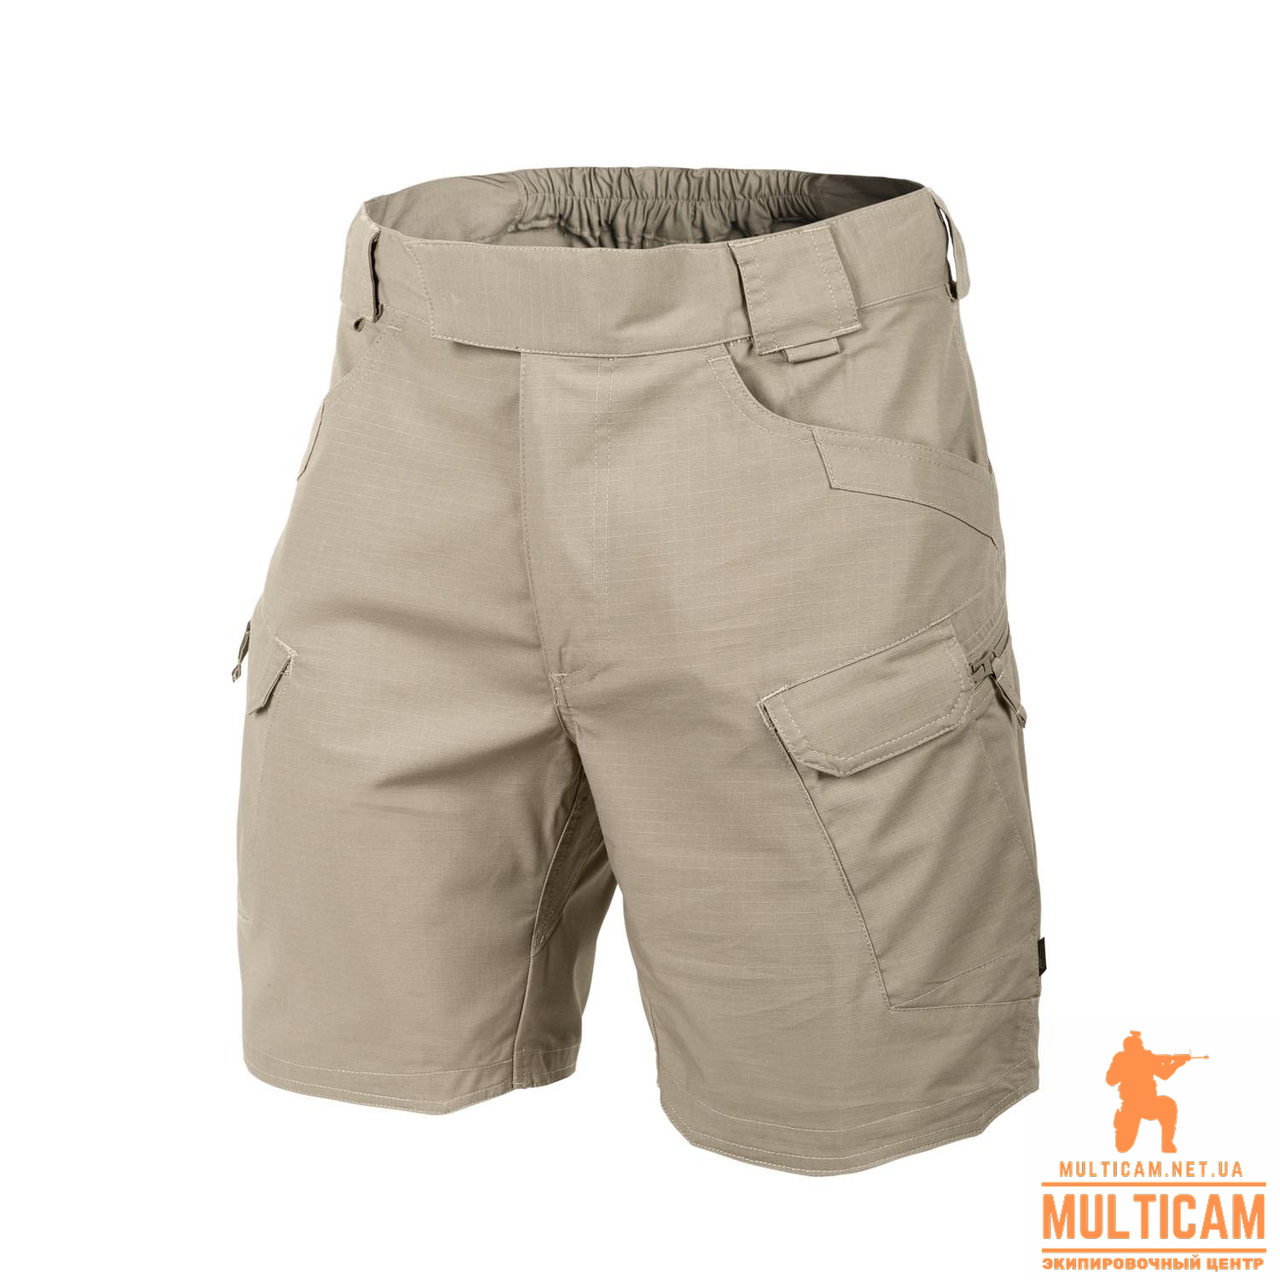 "Шорти Helikon-Tex® UTS (Urban Shorts®) 8.5""® - PolyCotton Ripstop - Khaki"